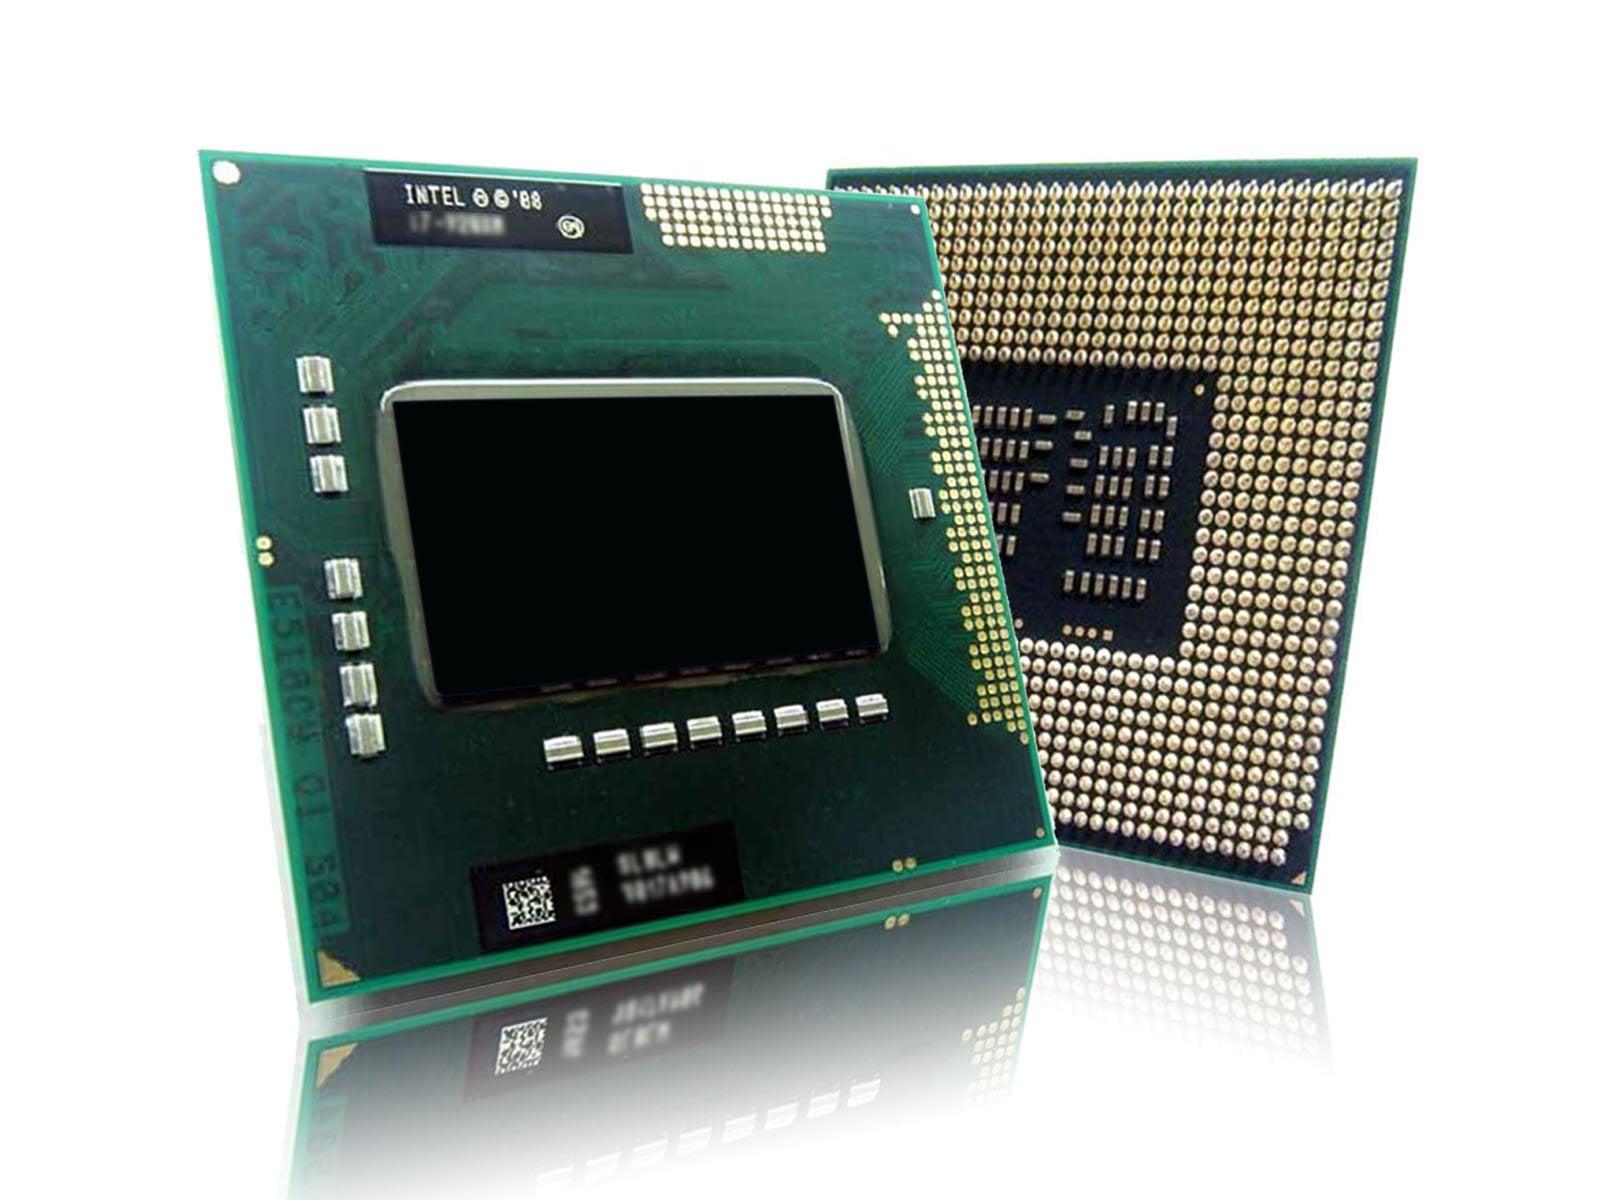 Intel i7-940XM 940M SLBSC Mobile CPU Processor Socket G1 PGA988A 2.13GHz 8MB 2.5 GT s by Intel